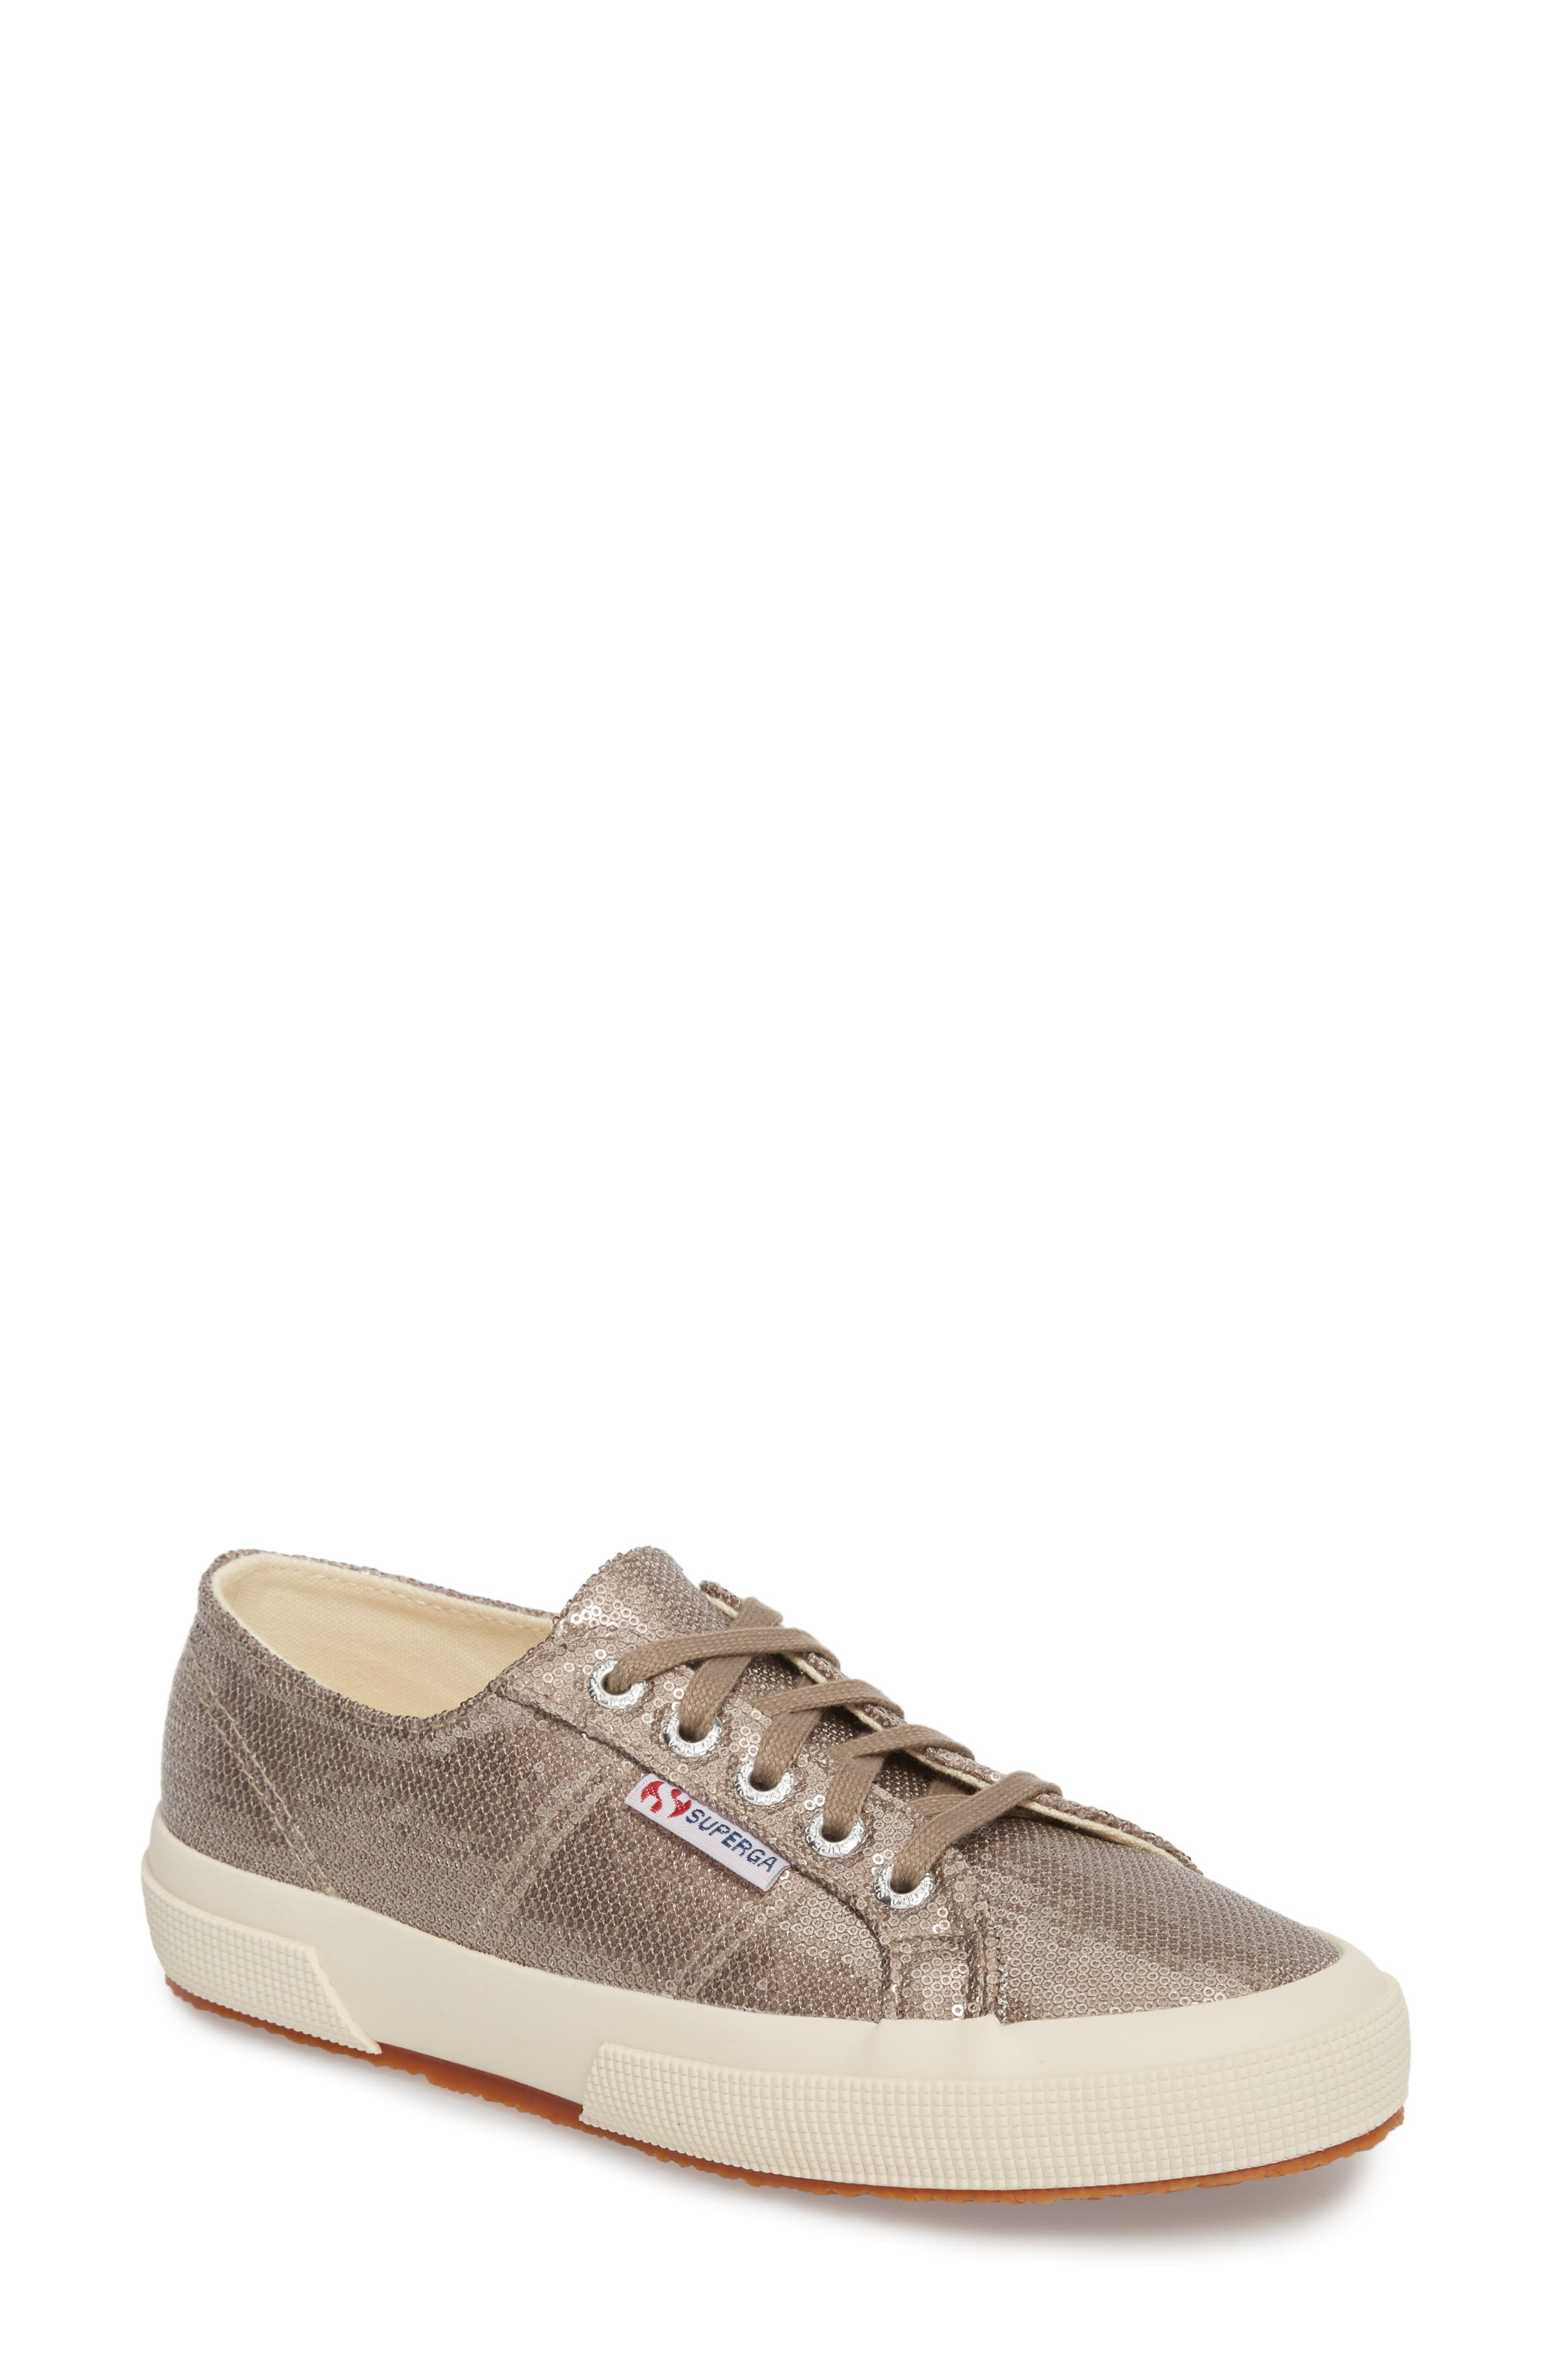 2750 Micro Sequin Sneaker,                             Main thumbnail 1, color,                             227